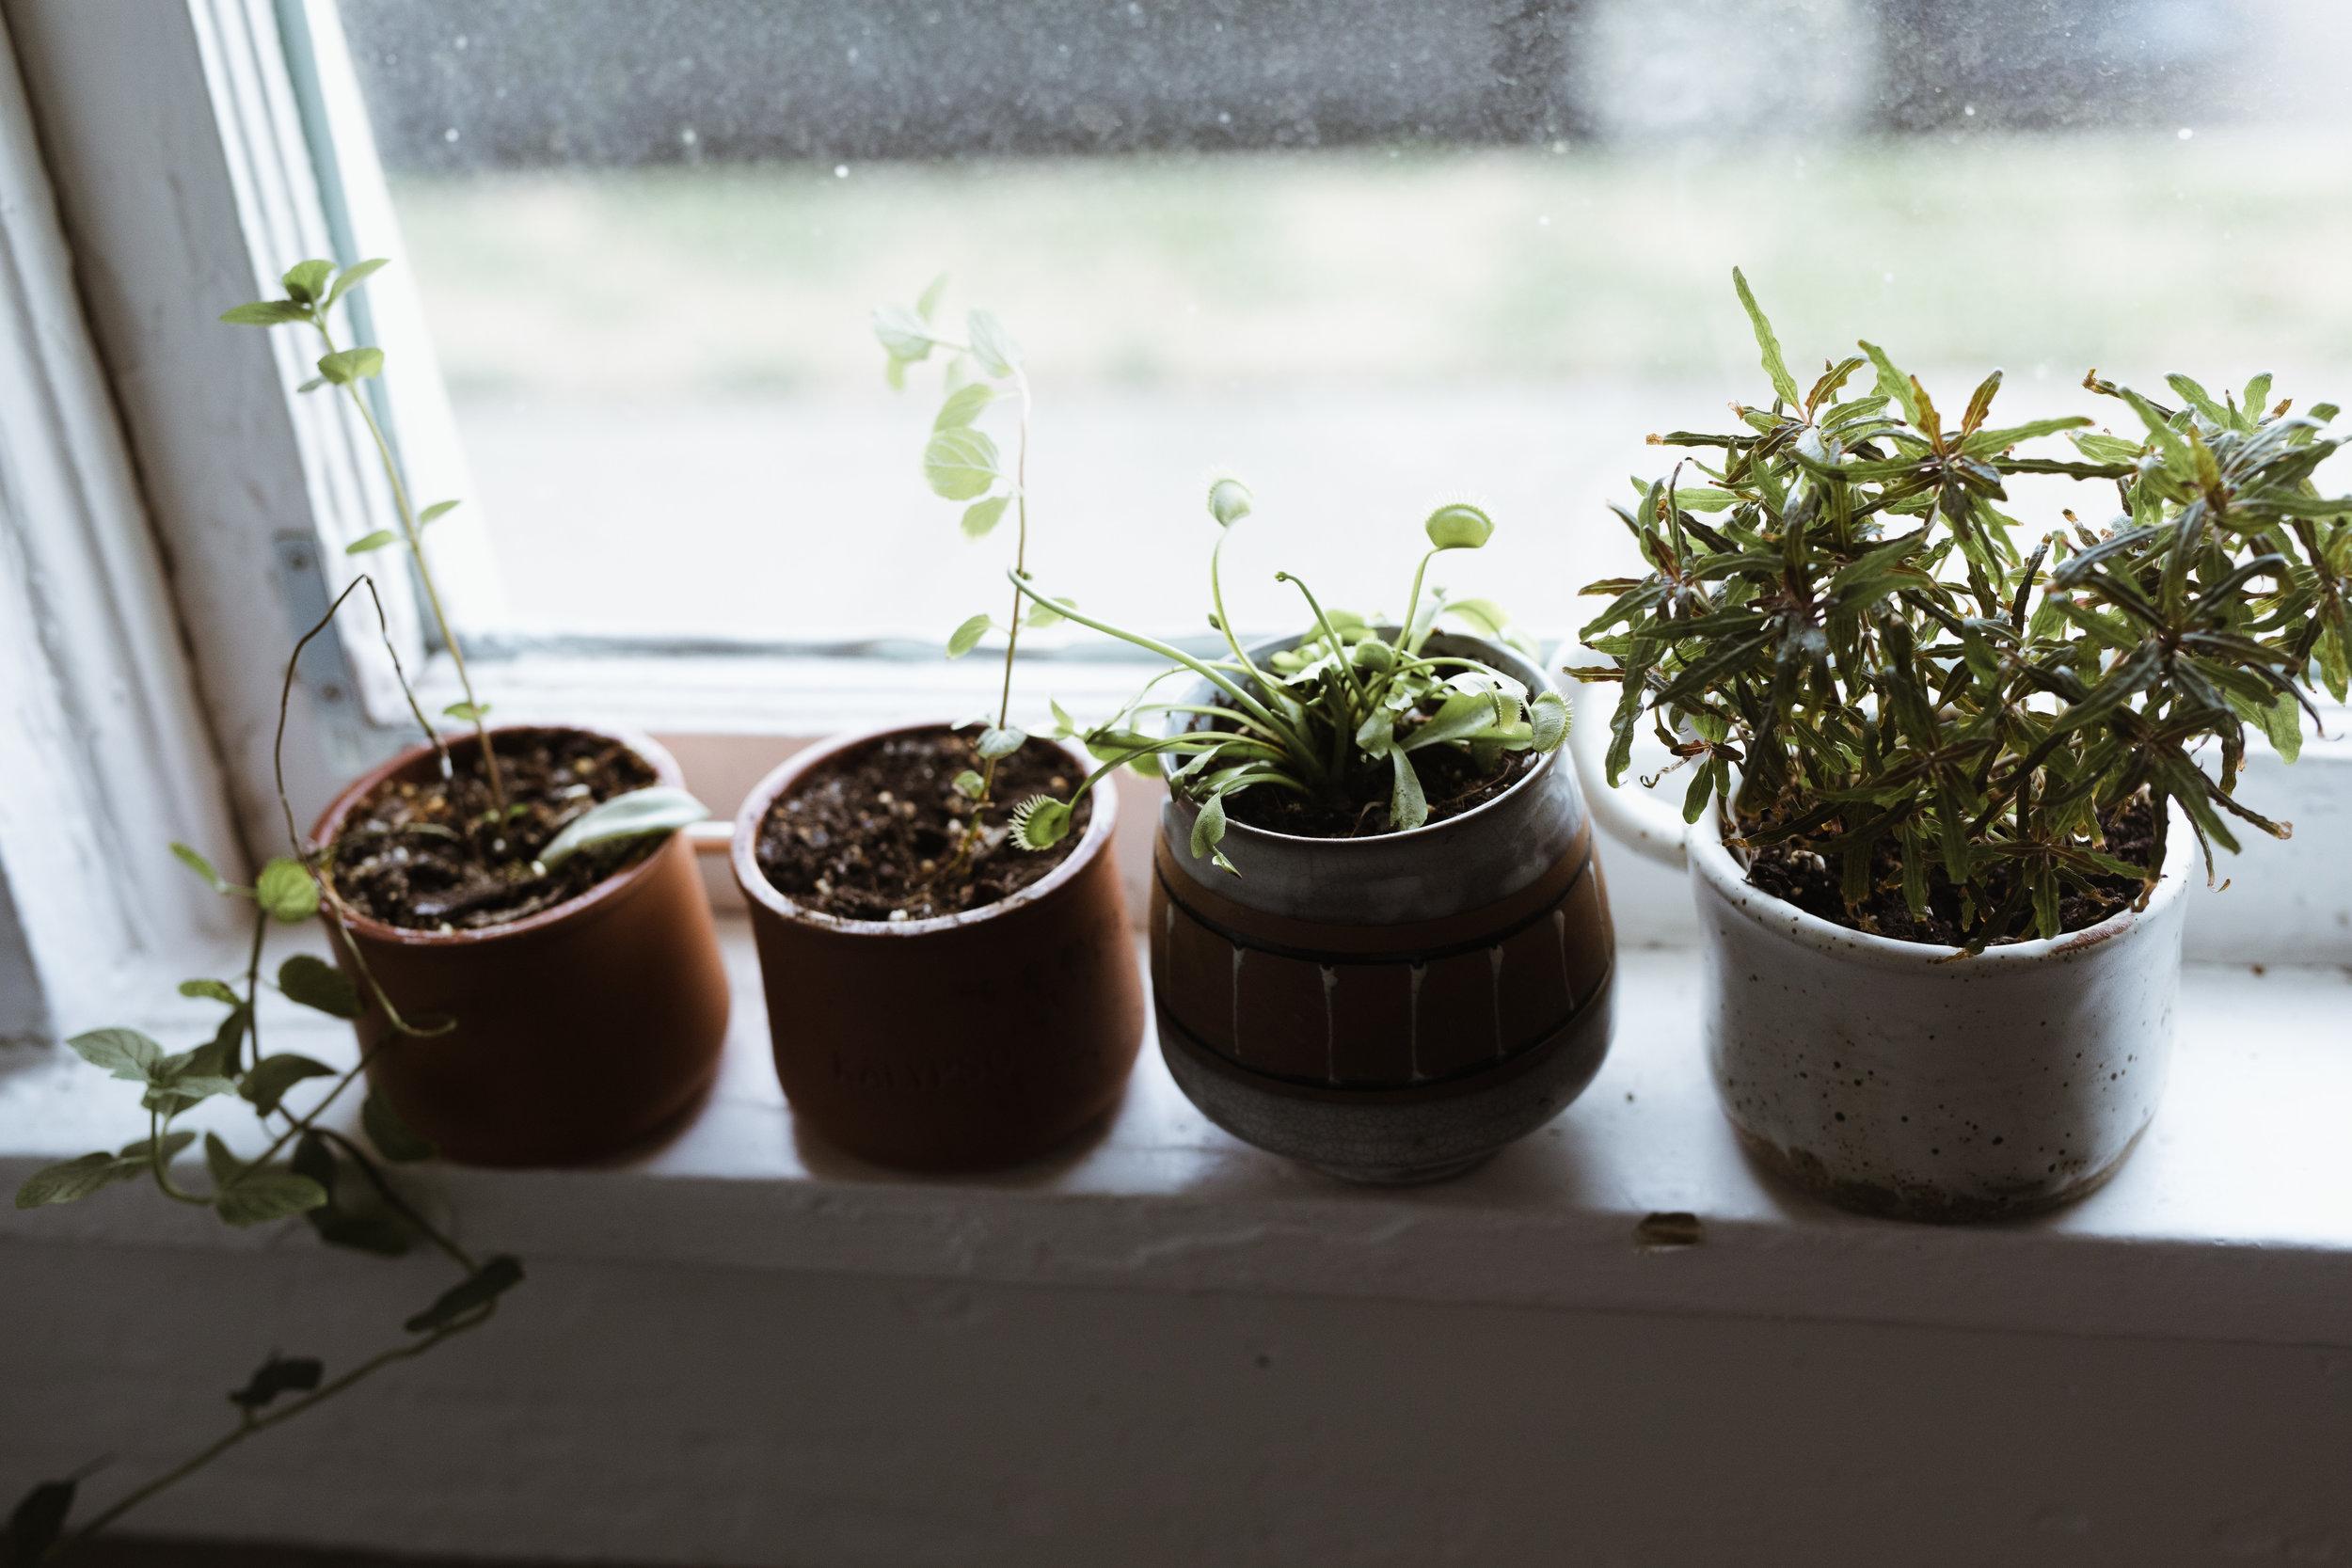 plants in home-6-2.JPG